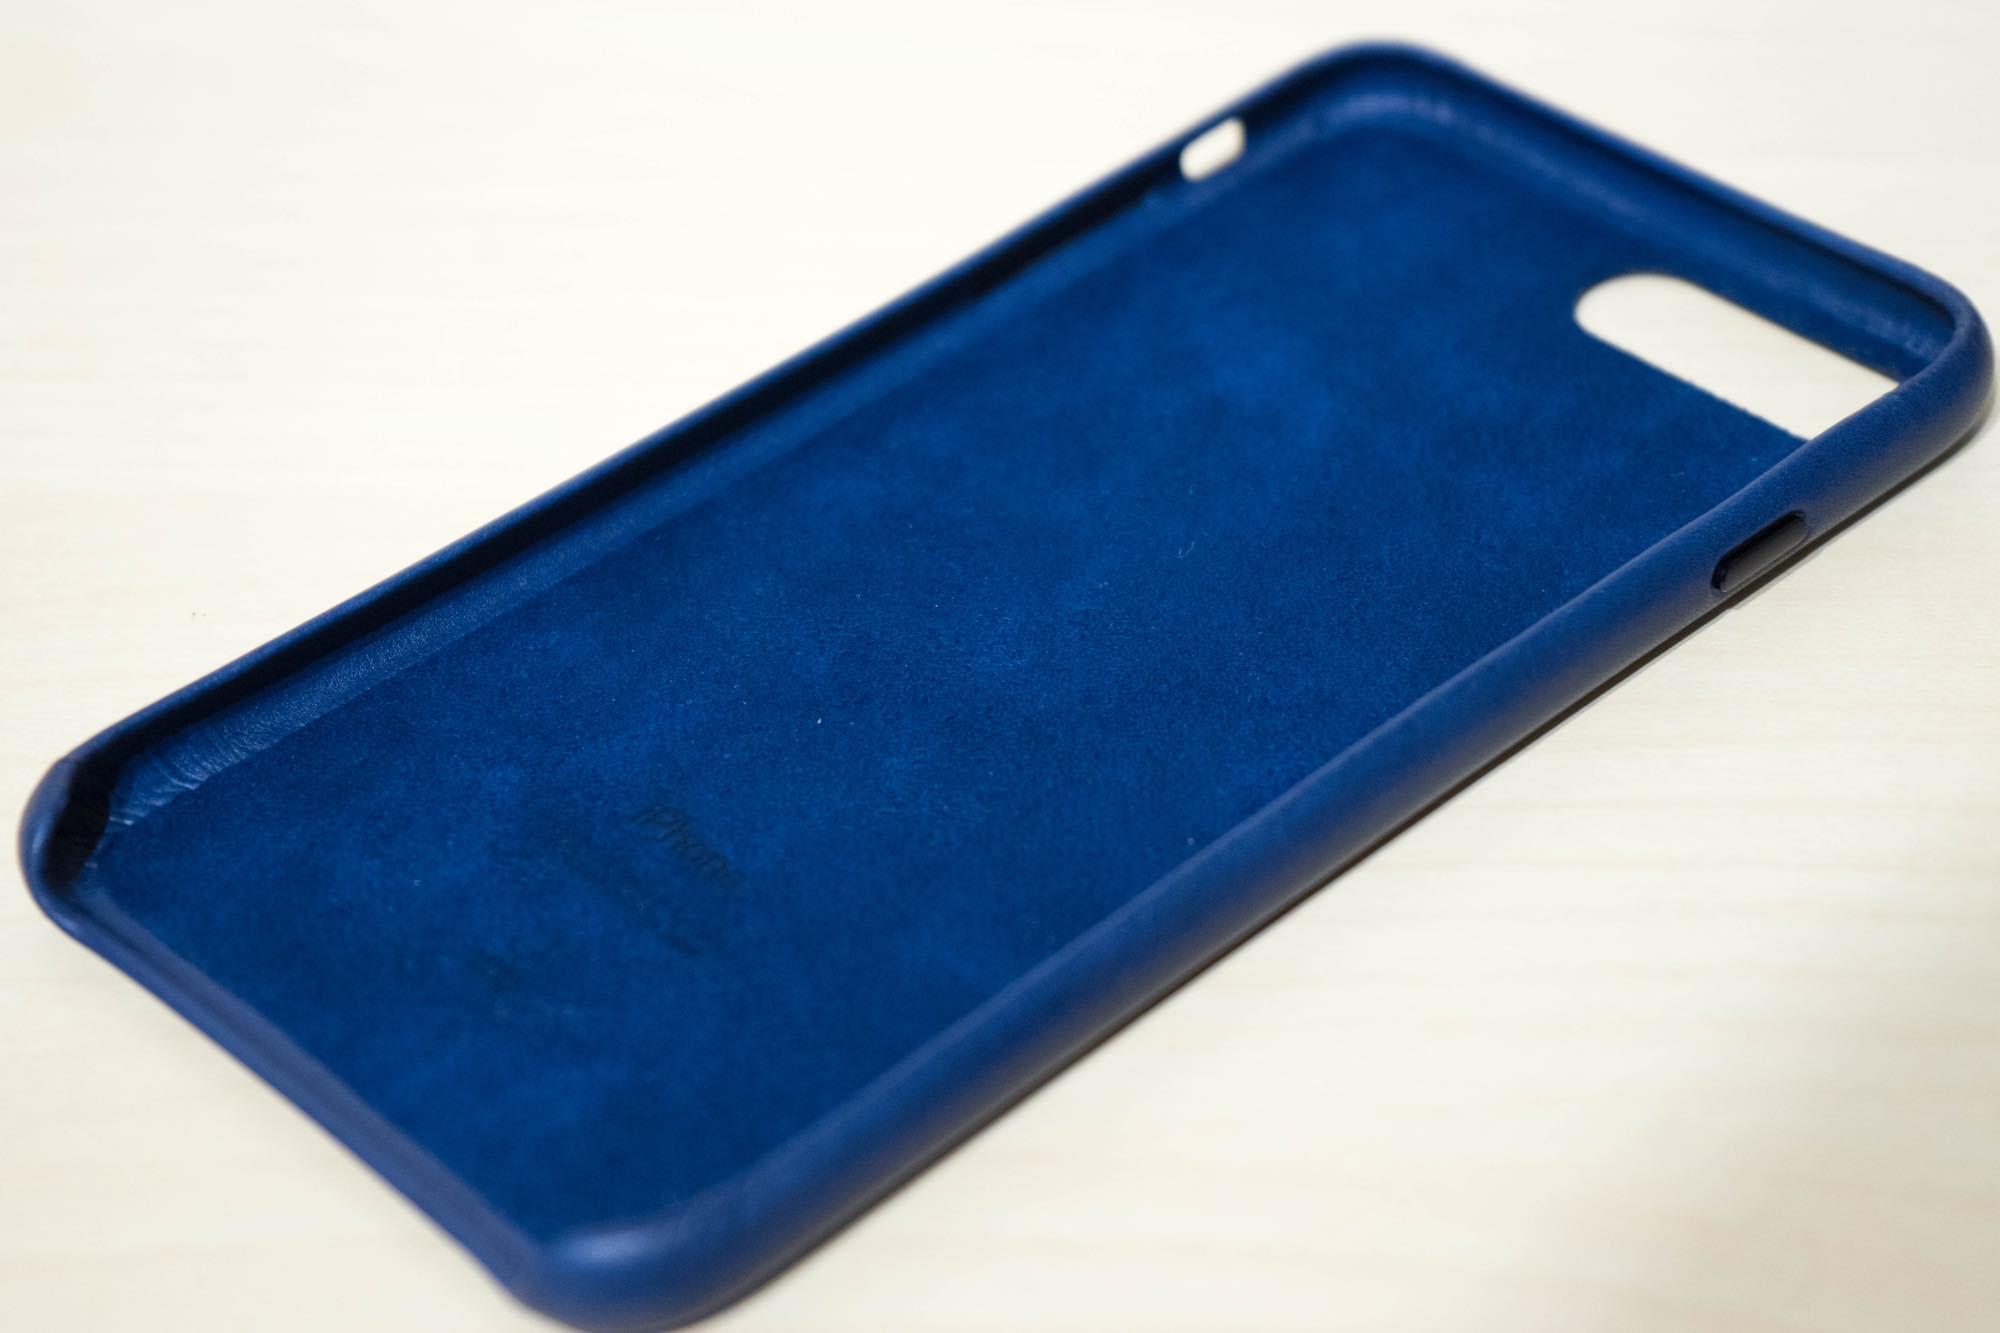 iphone7plus-leathercase-midnightblue6